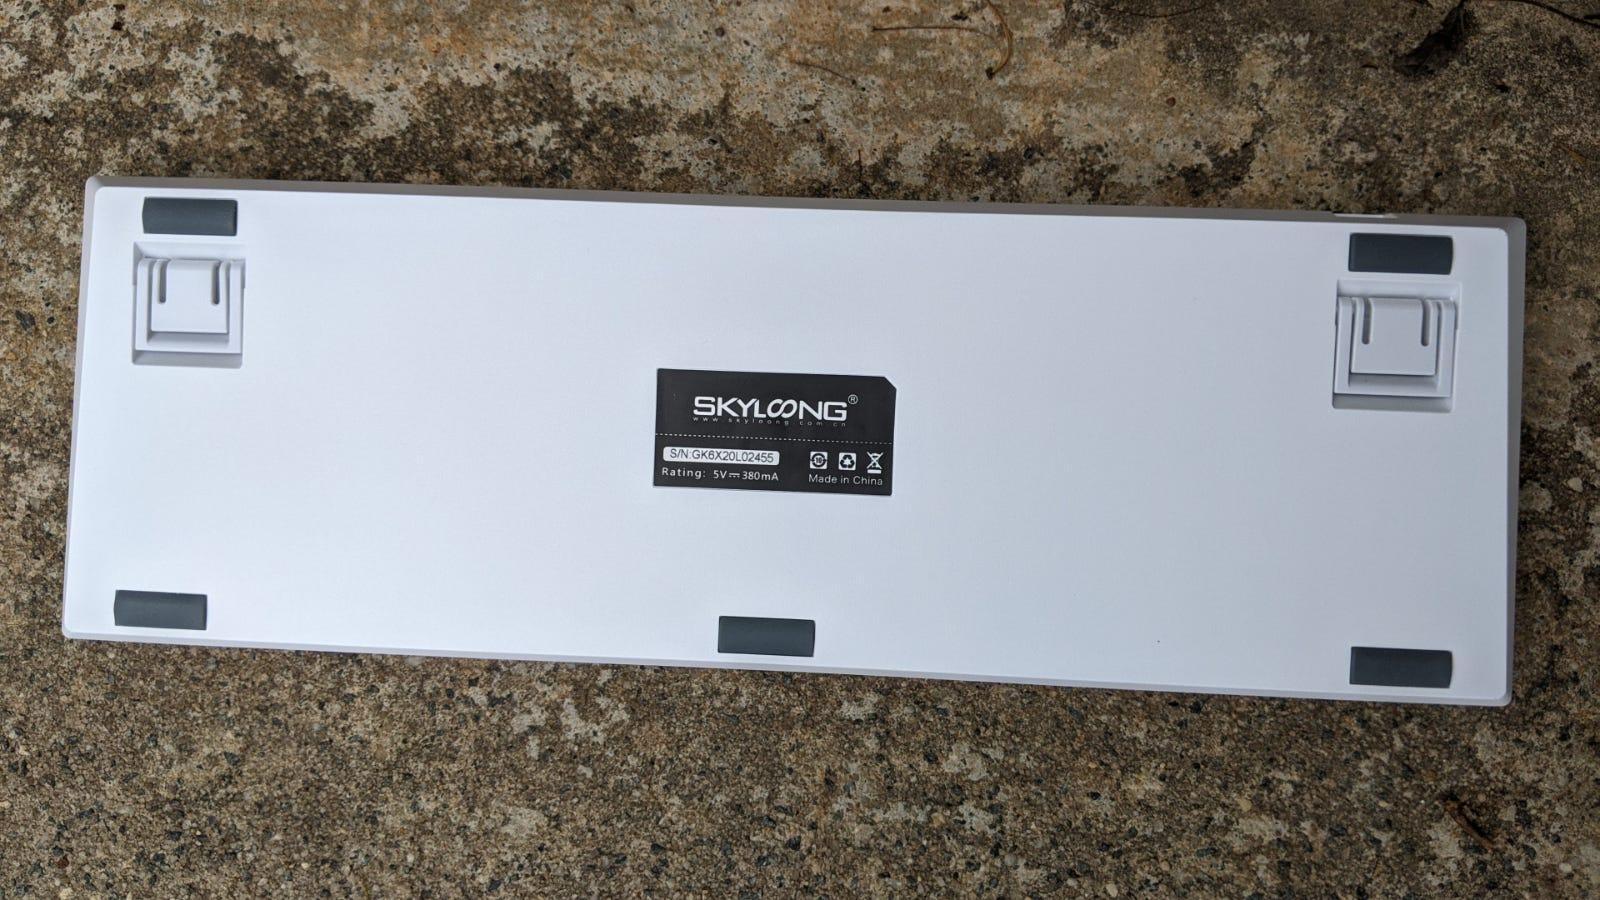 Epomaker GK96S turned upside down on concrete step